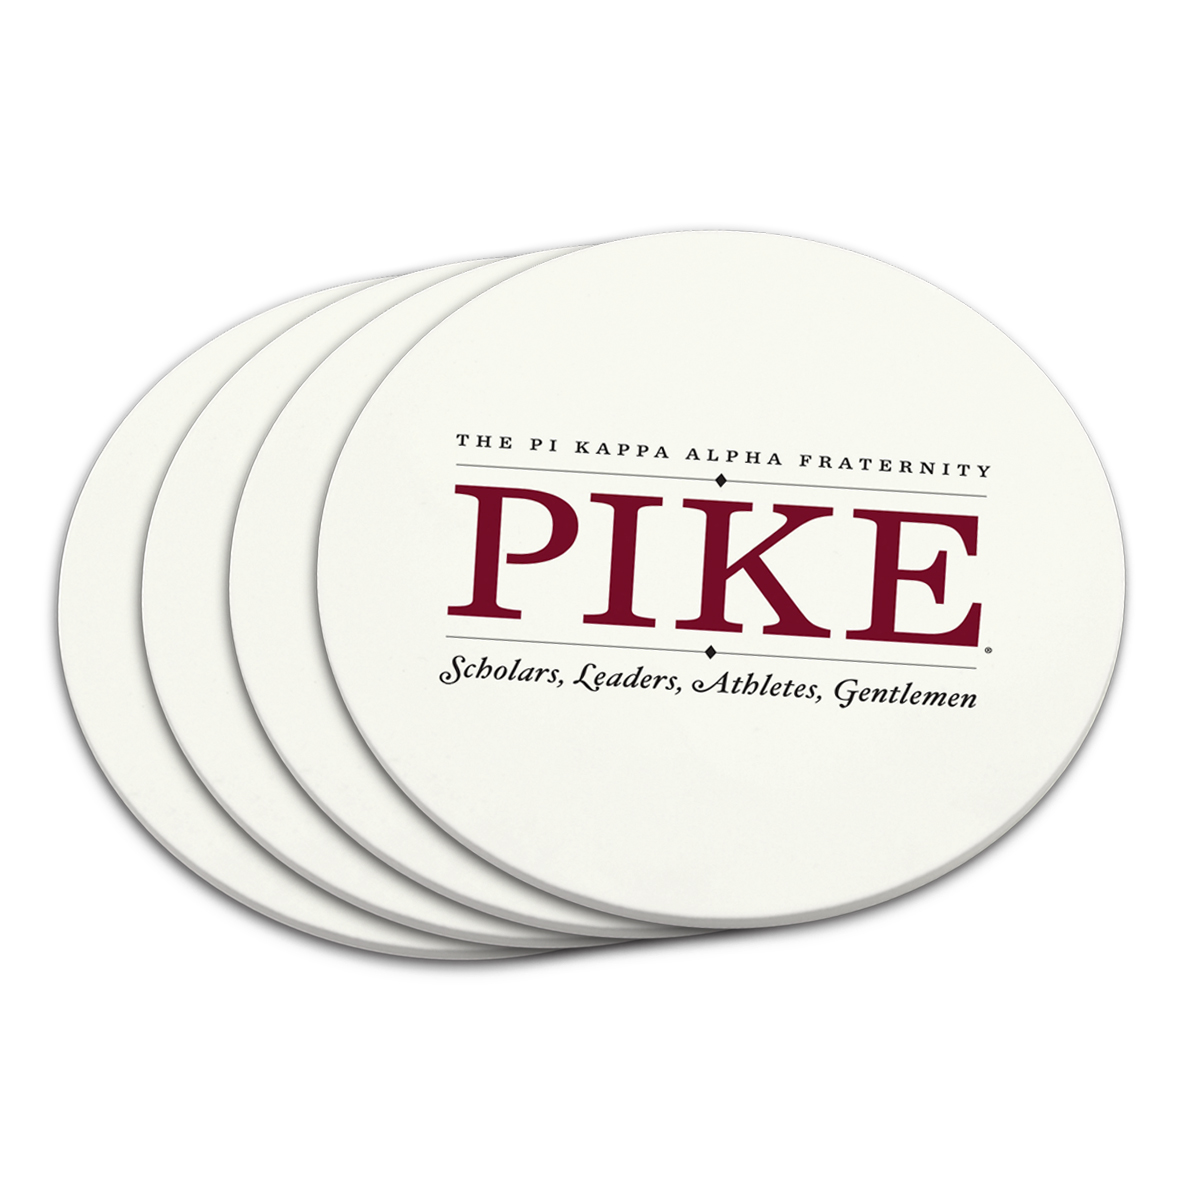 Coaster Set Pi Kappa Alpha Fraternity